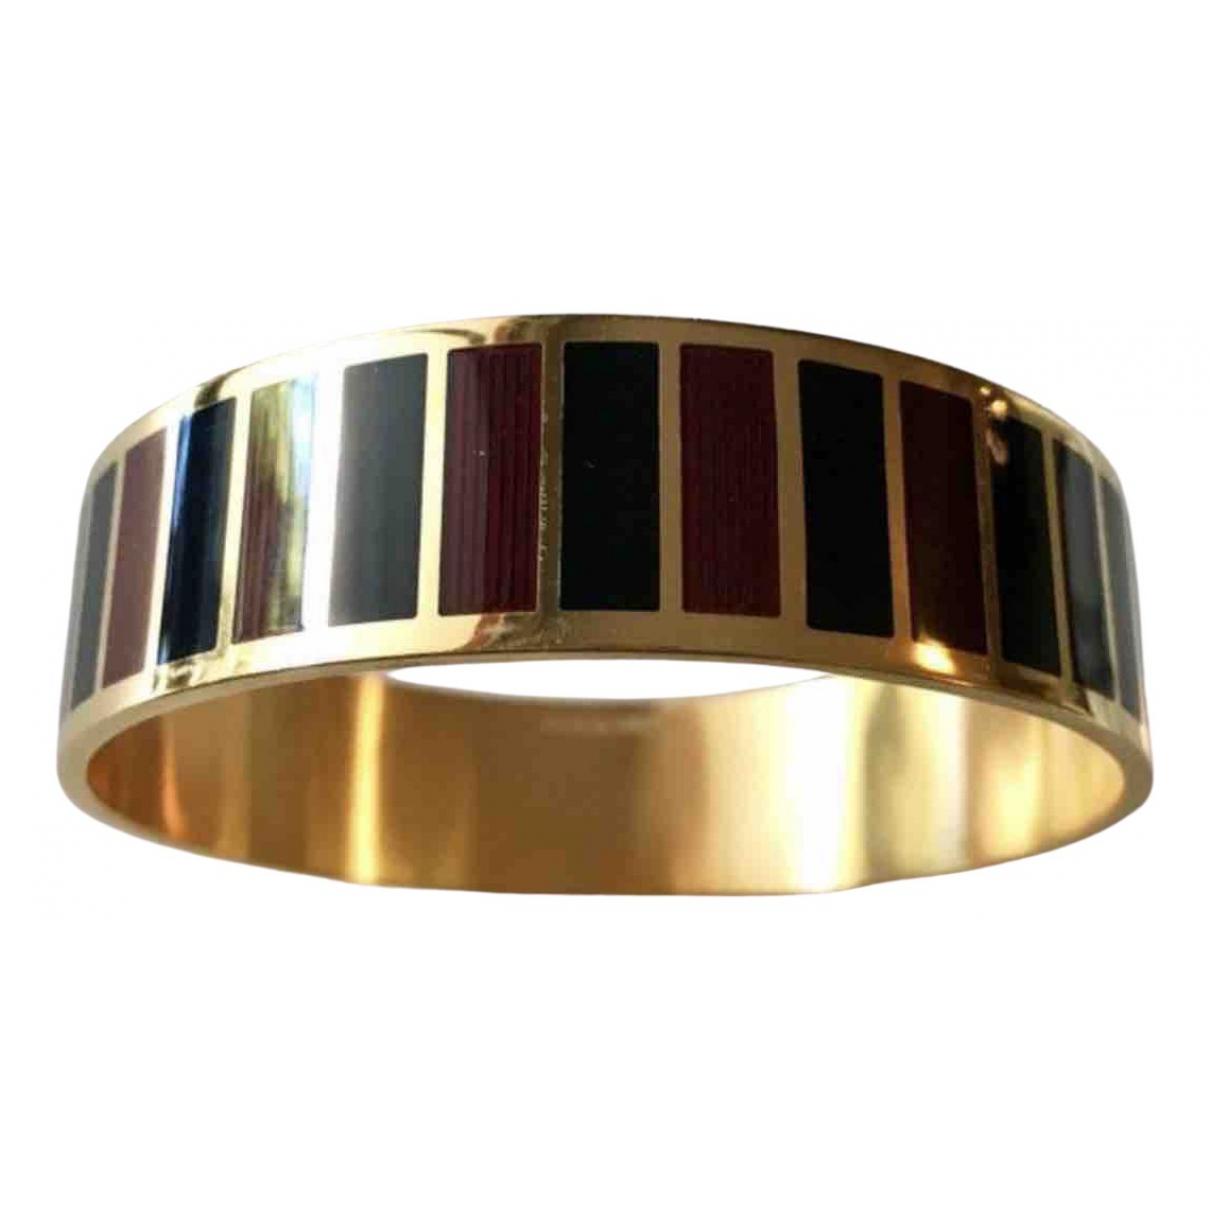 Givenchy \N Burgundy Metal bracelet for Women \N